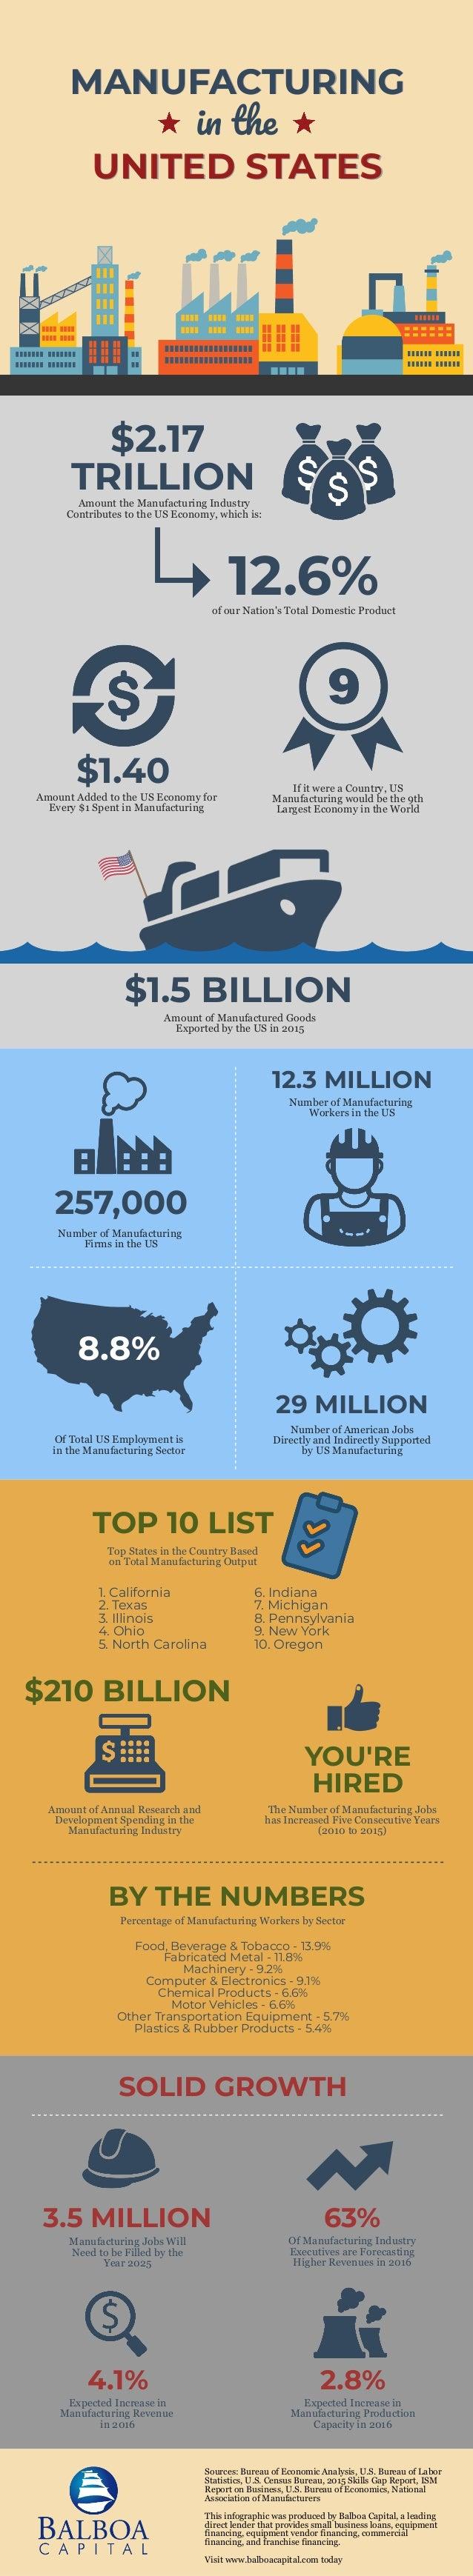 MANUFACTURINGMANUFACTURING i th UNITED STATESUNITED STATES $2.17 TRILLIONAmount the Manufacturing Industry Contributes to ...